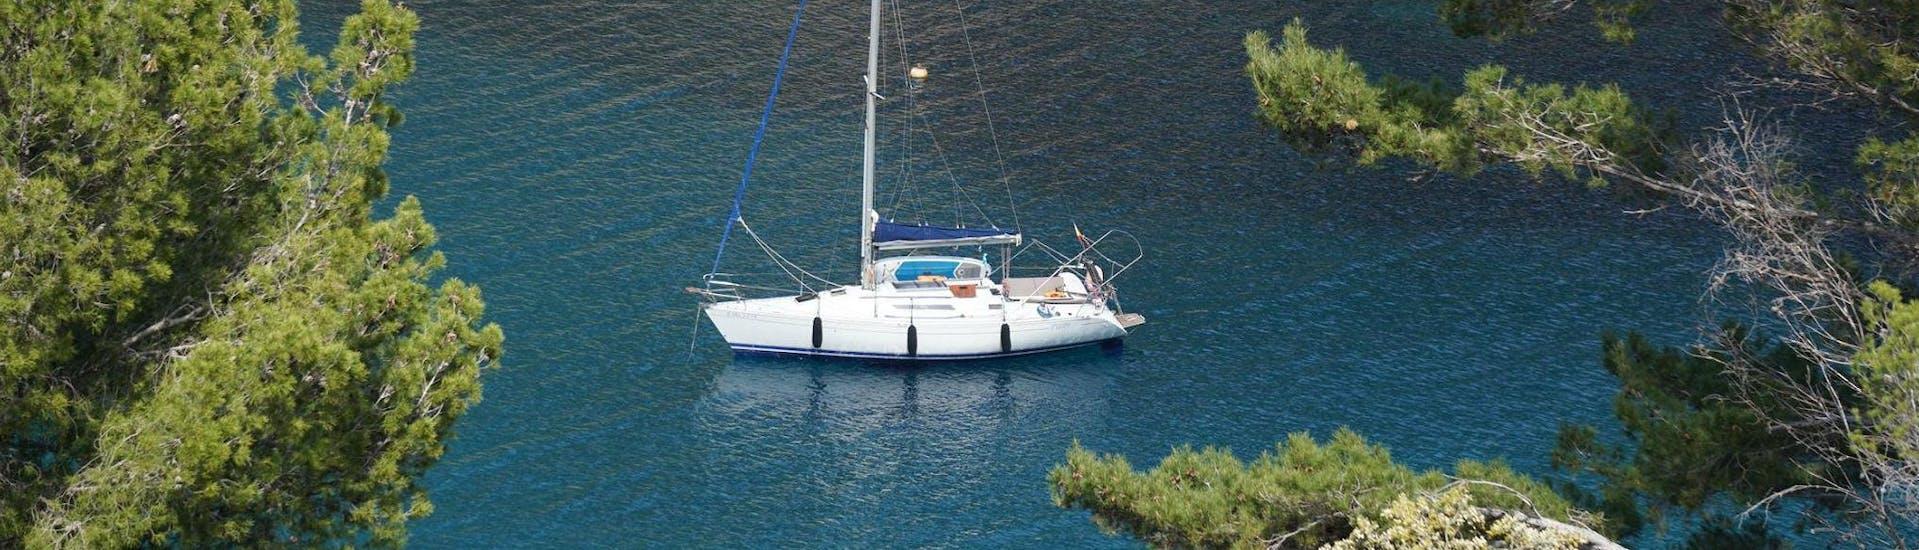 private-sailing-tour-as-desired-in-mallorca---spring-lets-sail-mallorca-hero